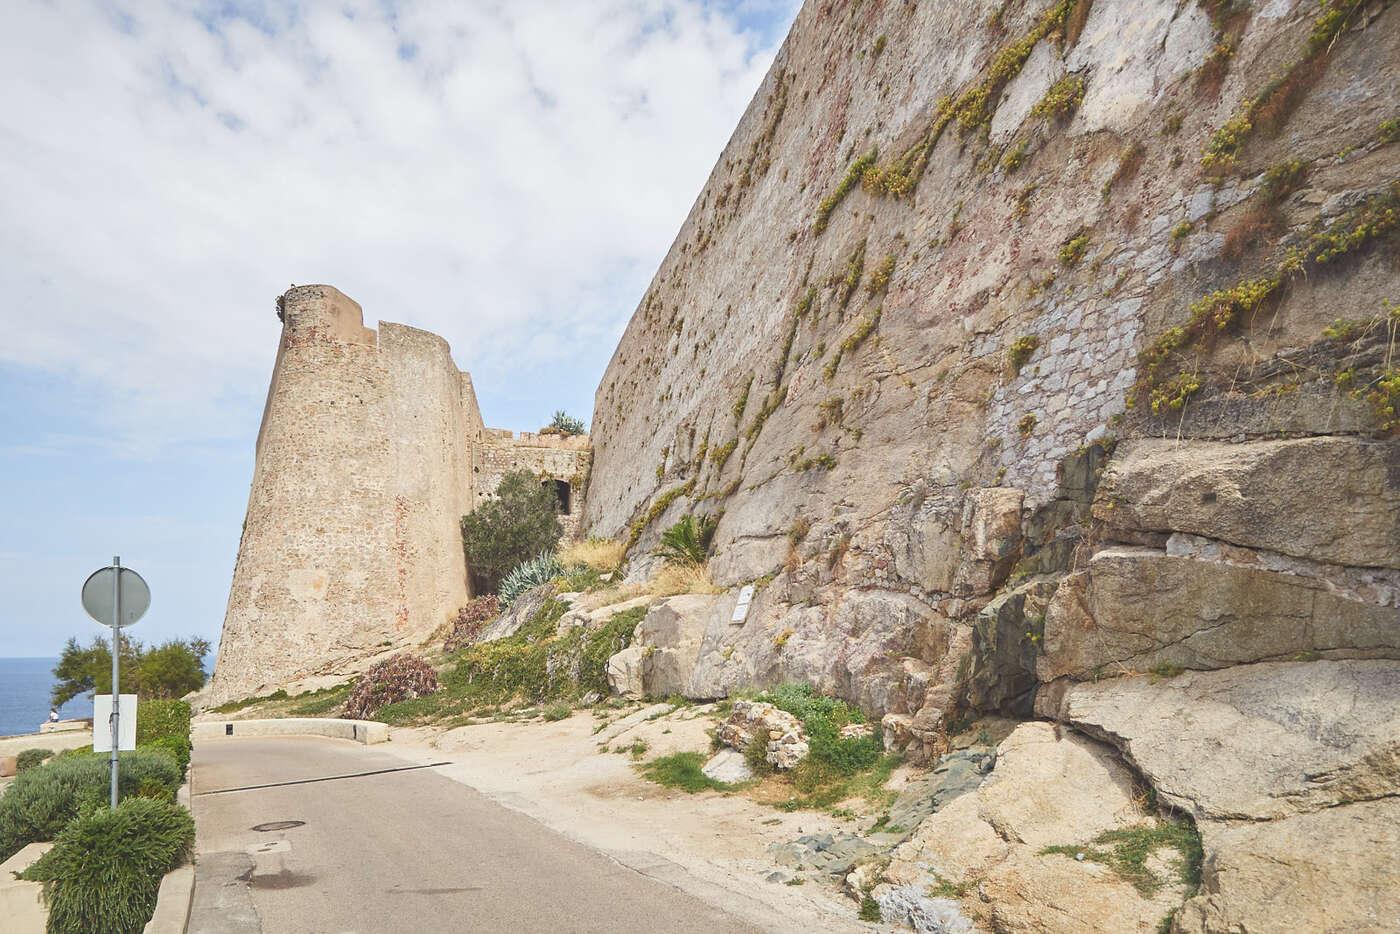 Remparts de la citadelle de Calvi